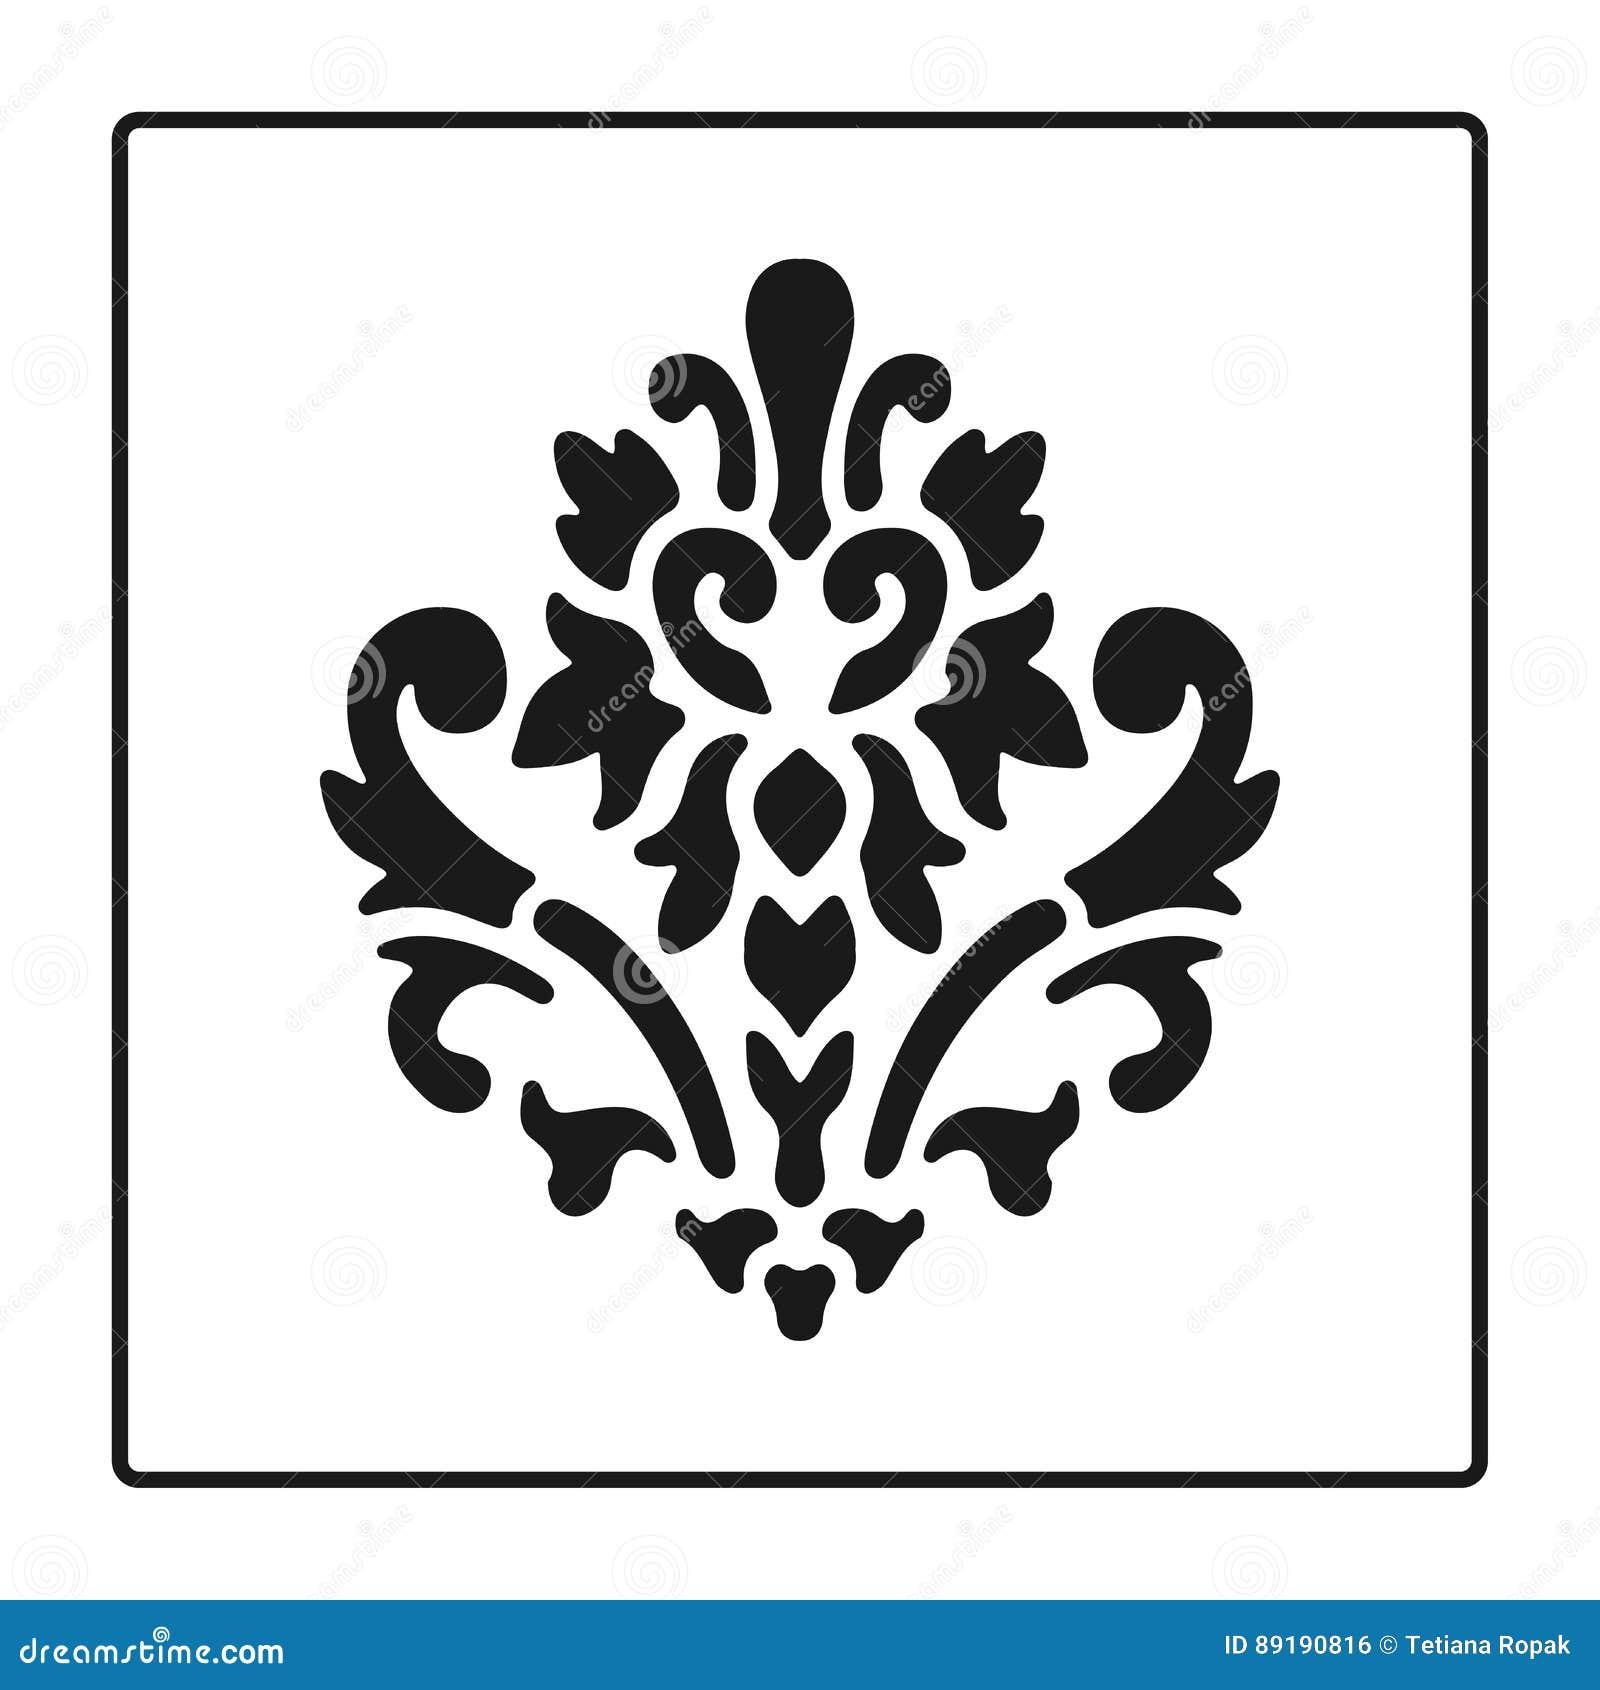 Flower symbol black silhouettes heraldic symbol baroque style flower symbol black silhouettes heraldic symbol baroque style vector illustration medieval sign glowing french fleur de lis biocorpaavc Gallery